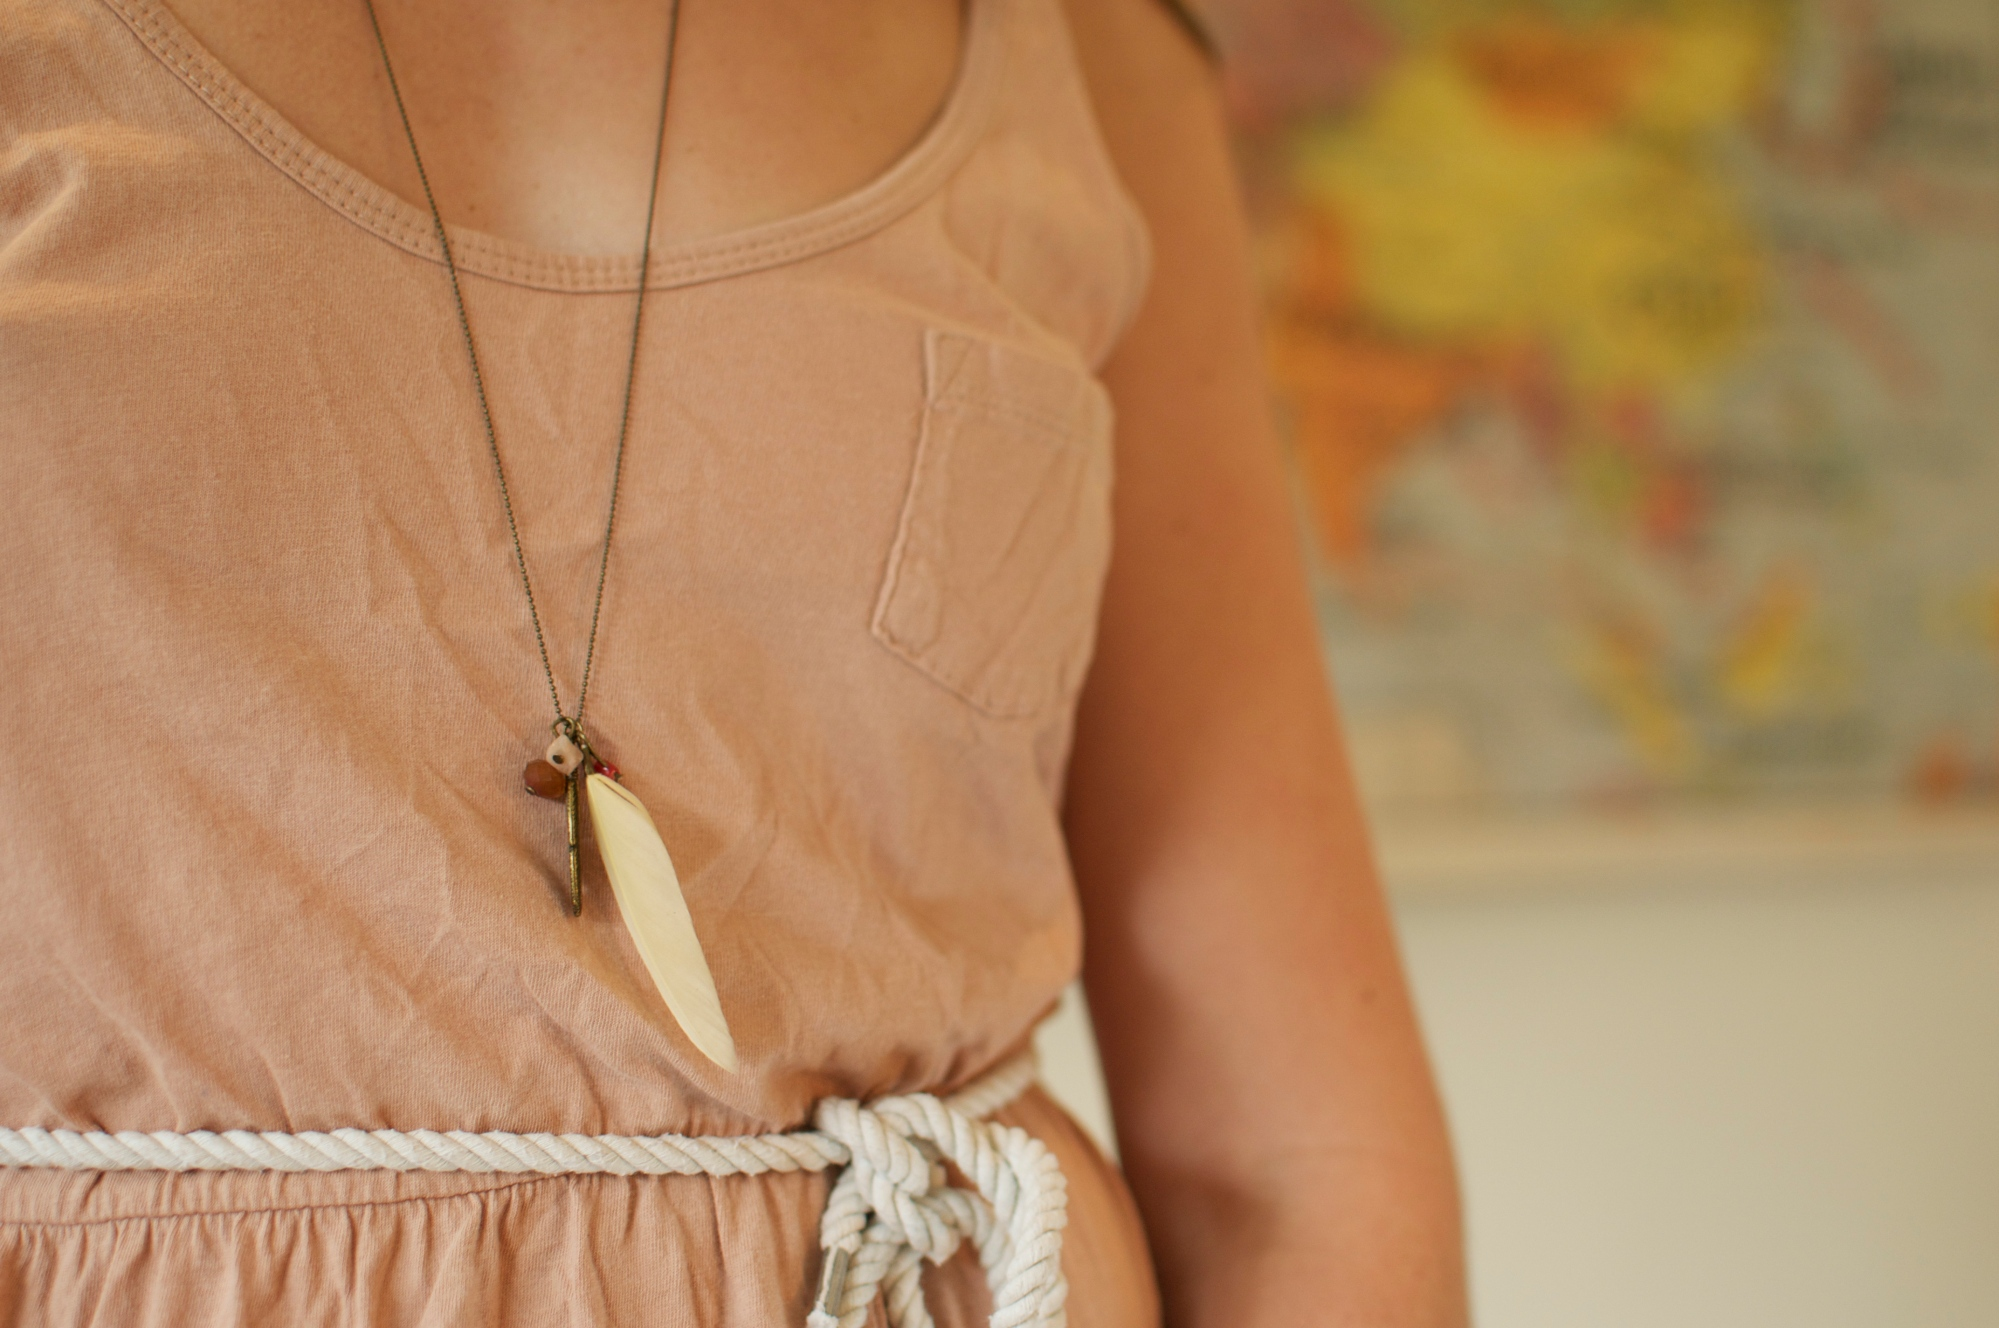 collier long chaine pierre plume laion  fin